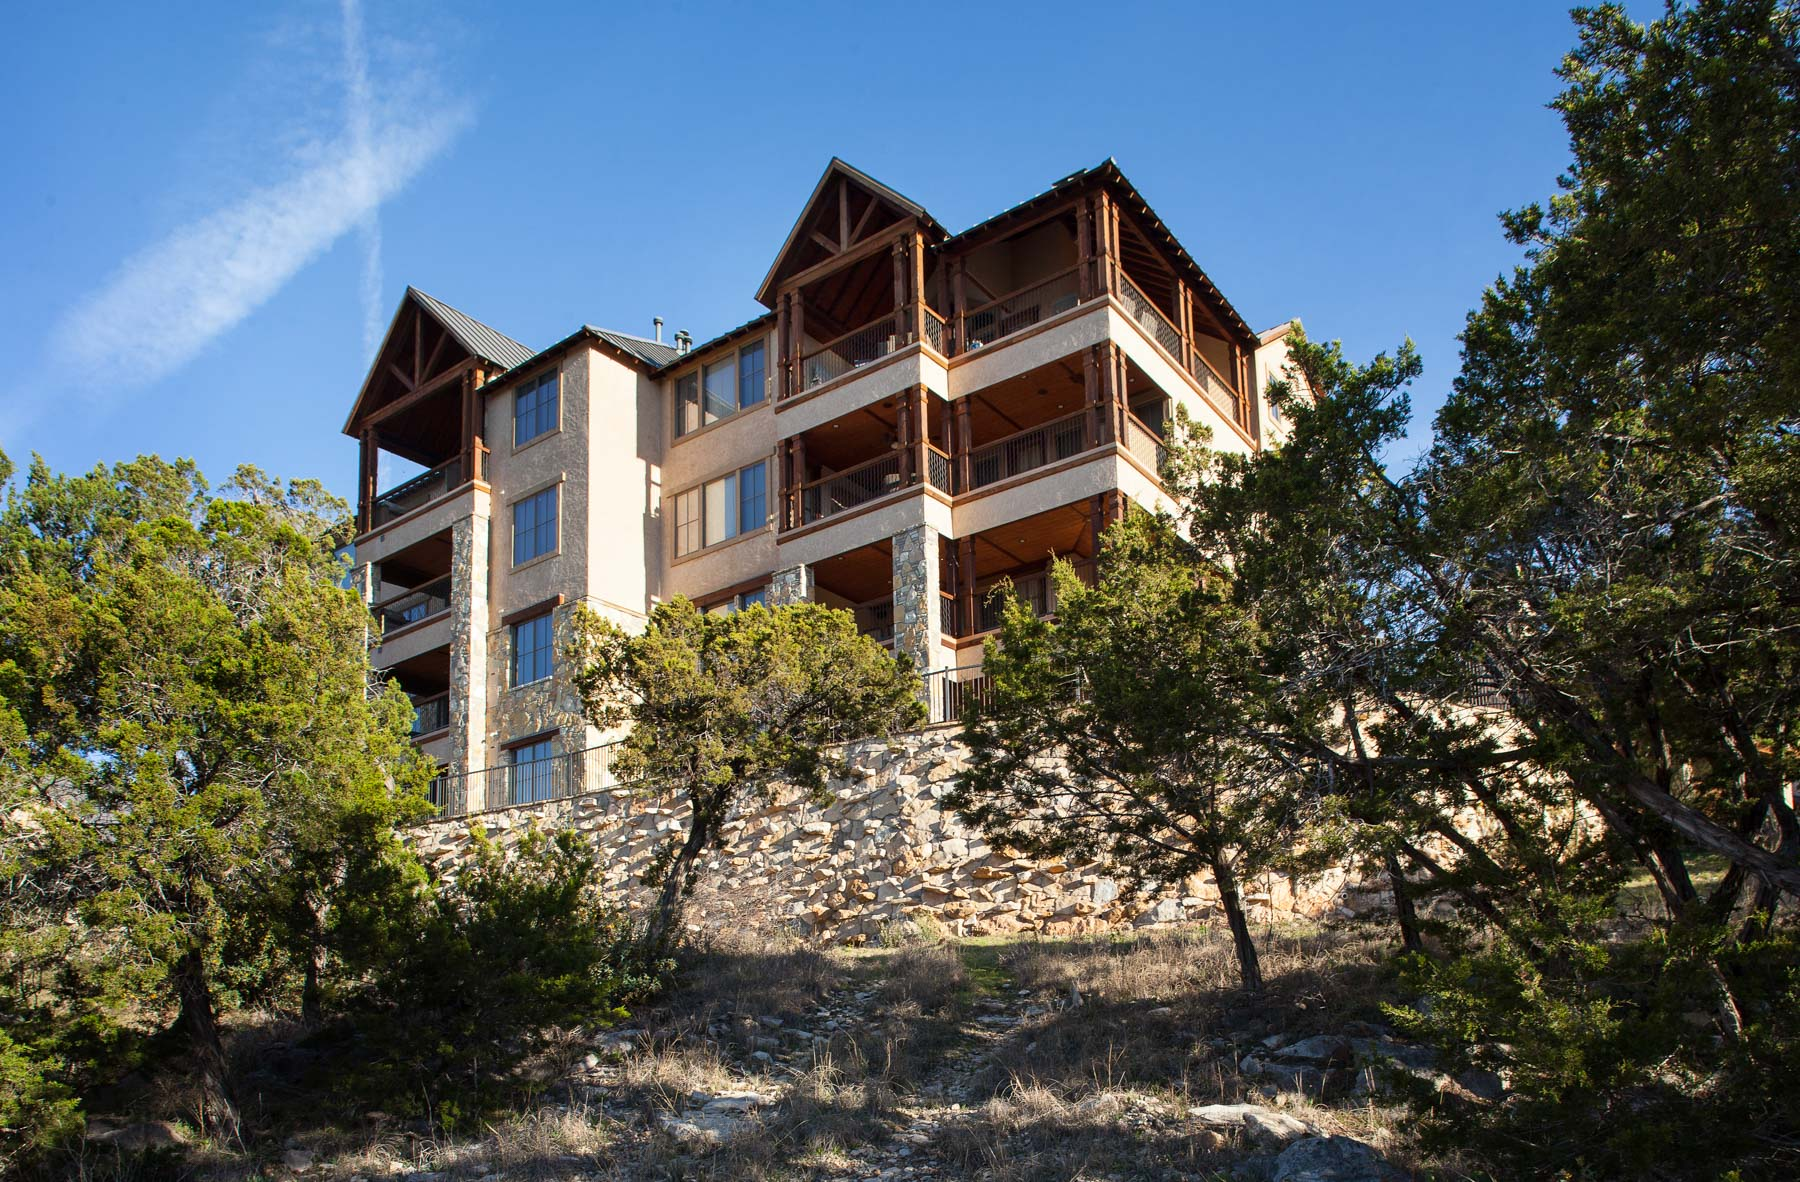 共管物業 為 出售 在 Elegant Texas Rustic-chic Condo 1653 Scenic Drive #402-3 Graford, 德克薩斯州, 76449 美國